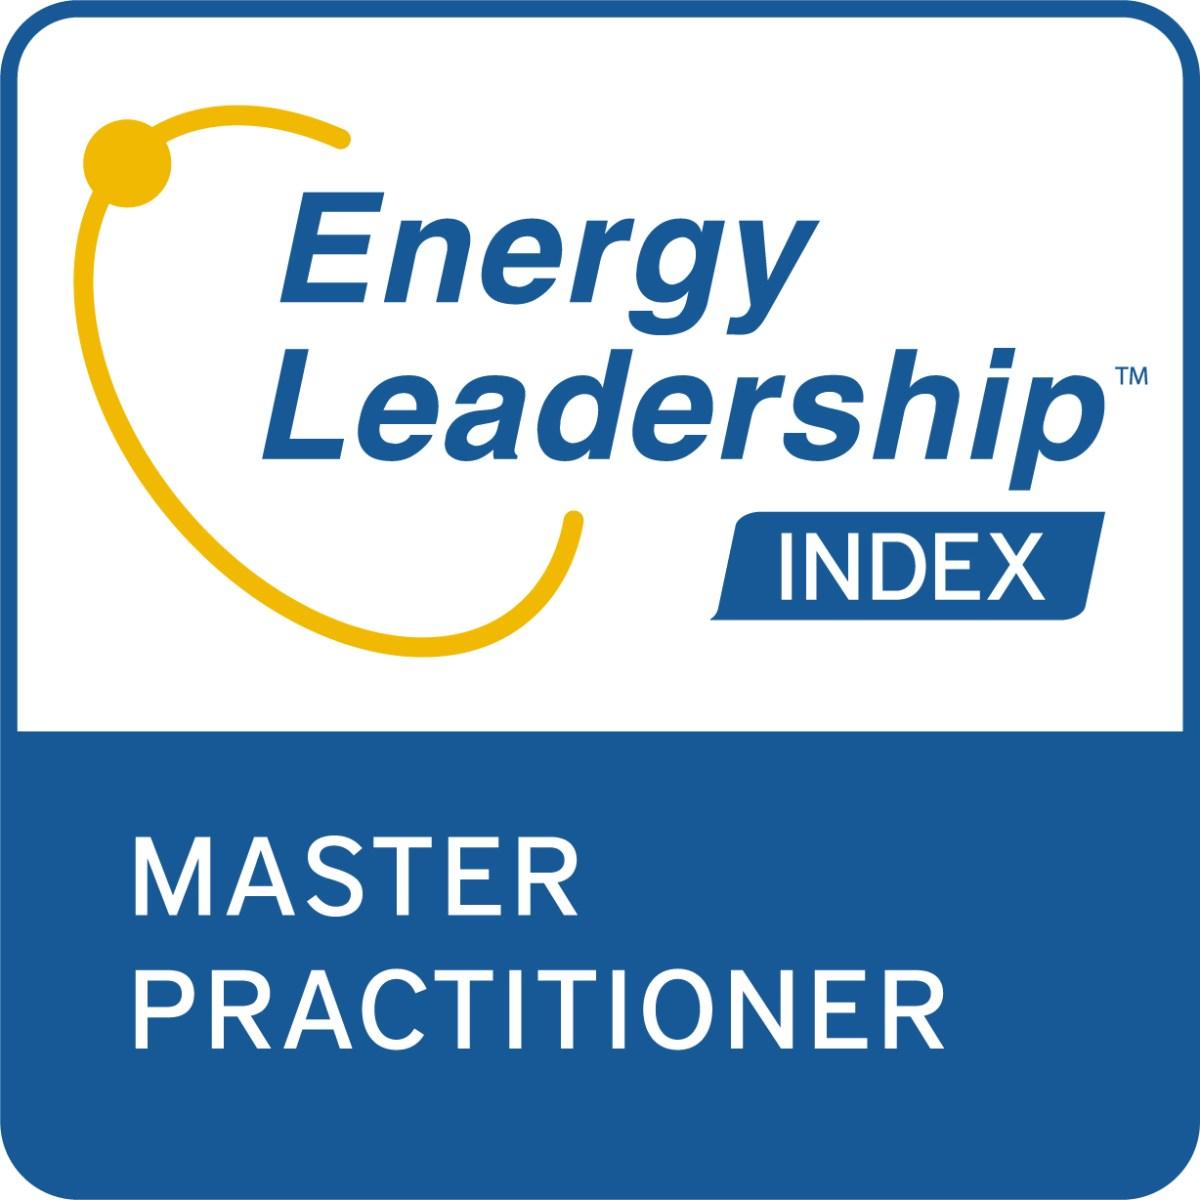 Energy Leadership Index Master Practitioner